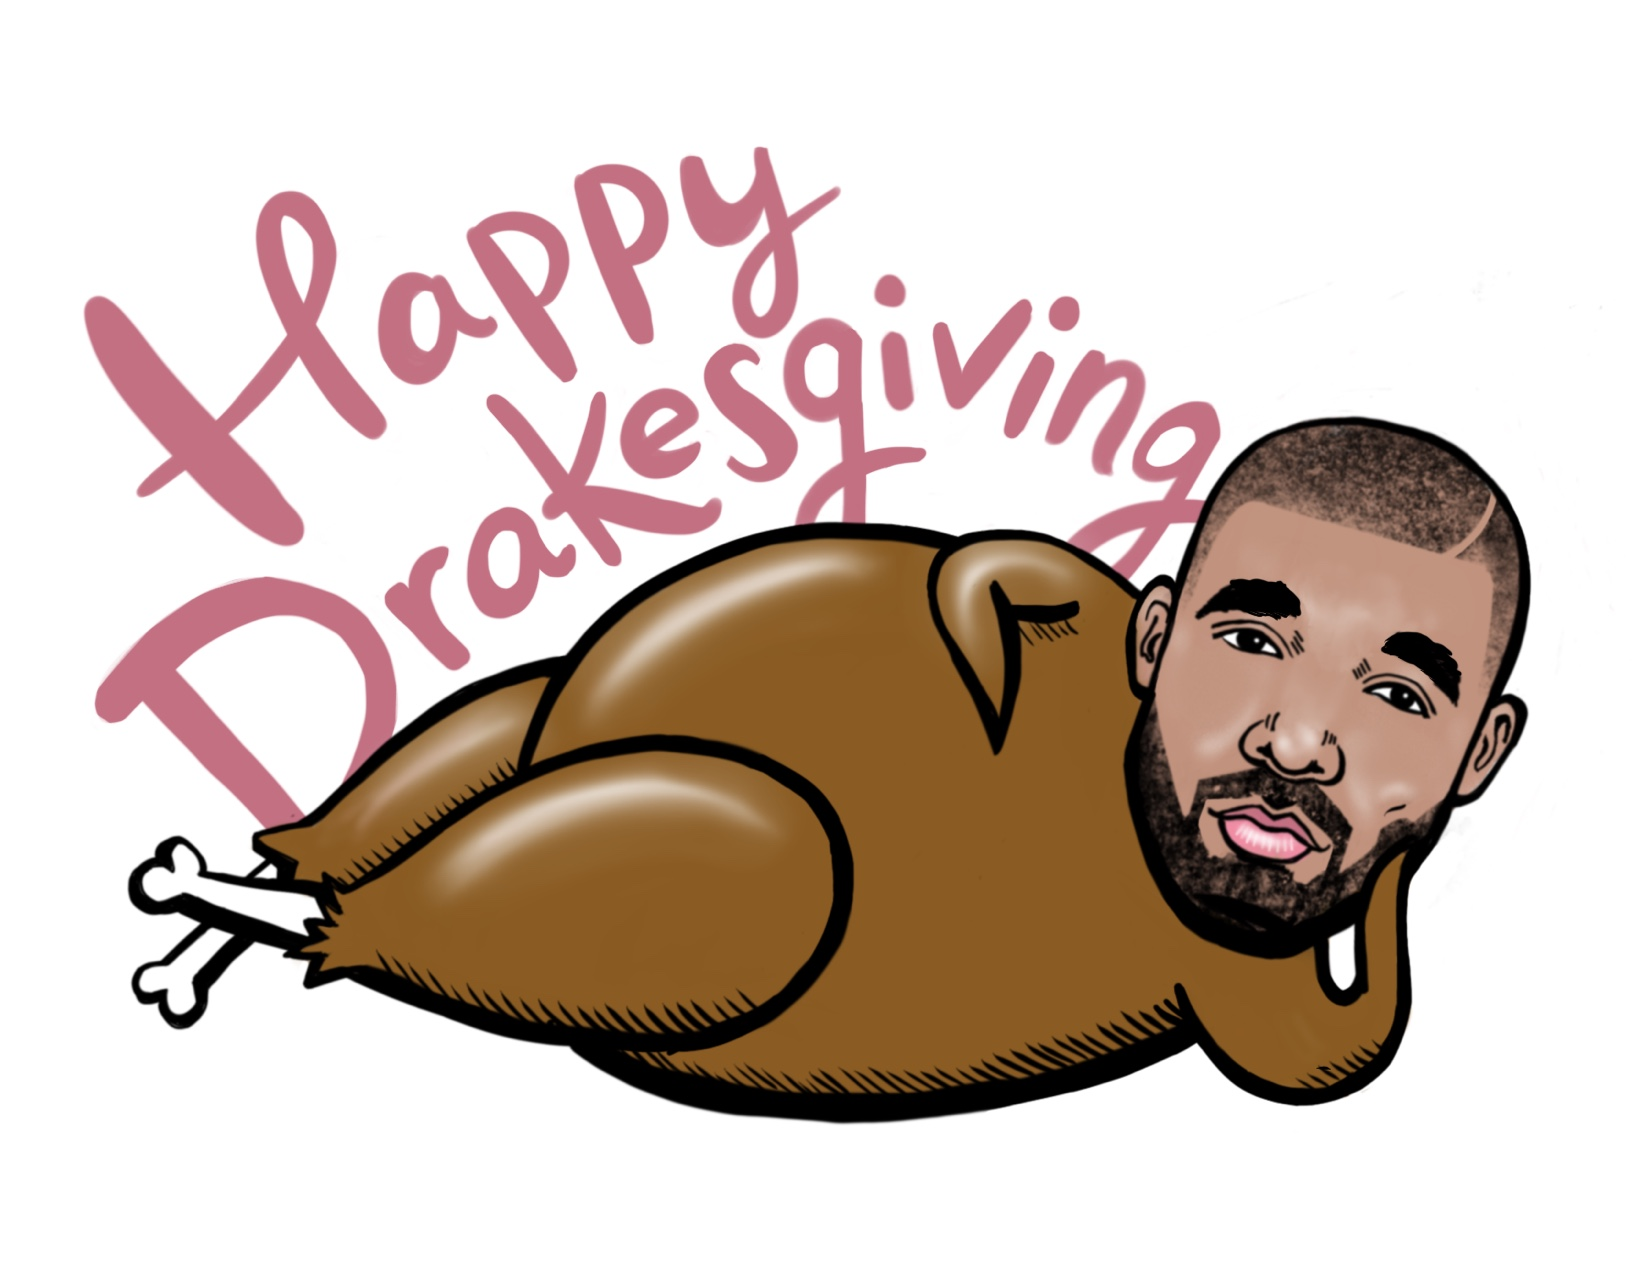 Happy Drakesgiving - Drake's head on a turkey body